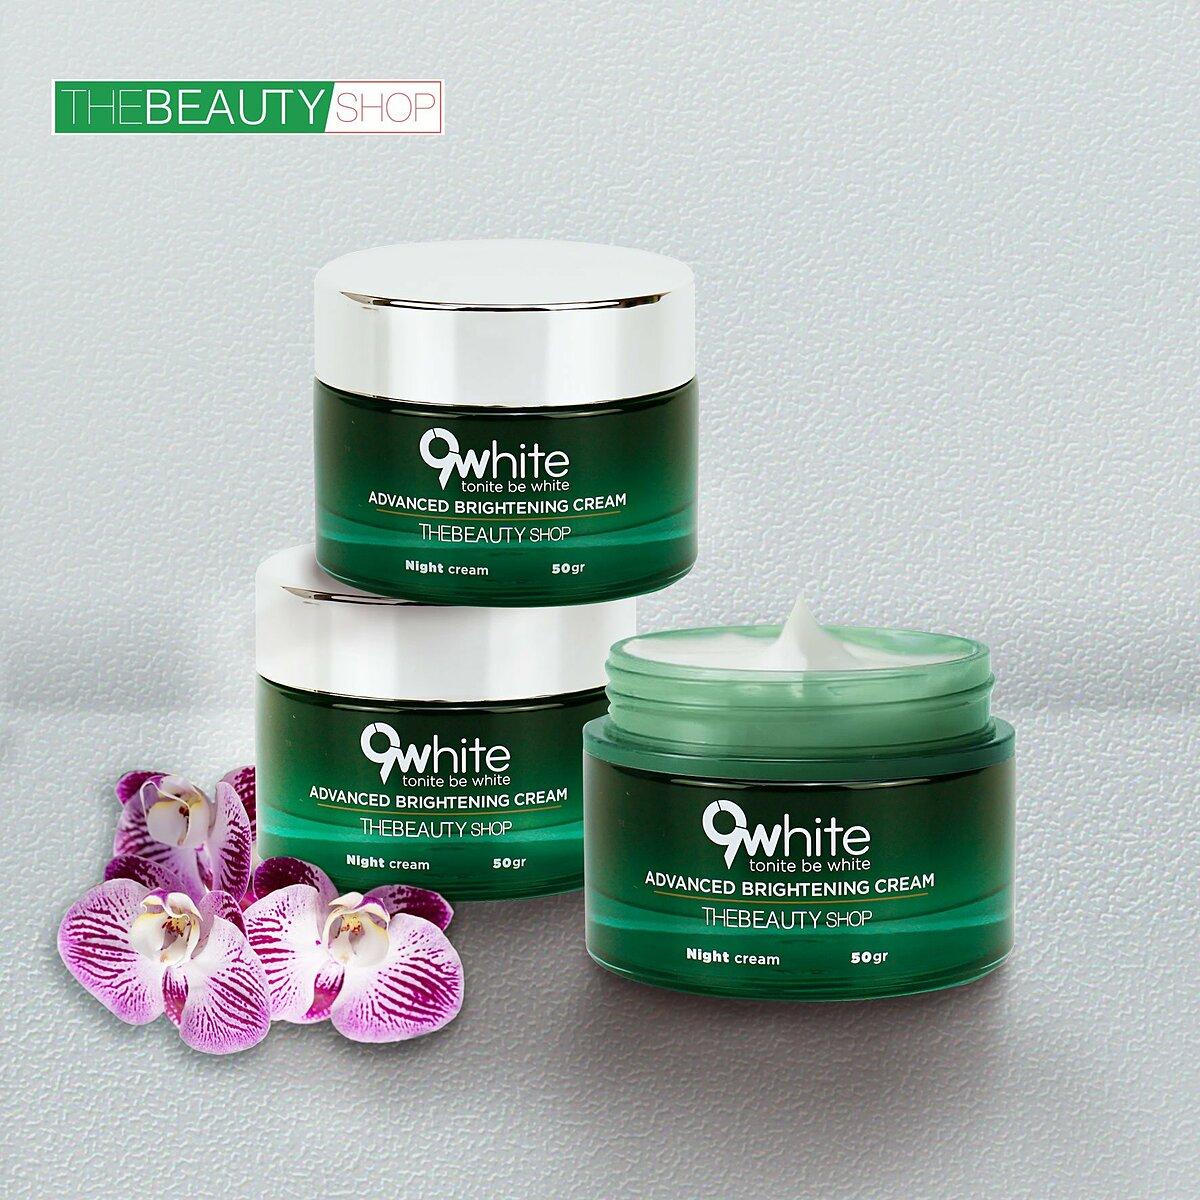 Kem dưỡng trắng 9White - Advanced Brightening Cream